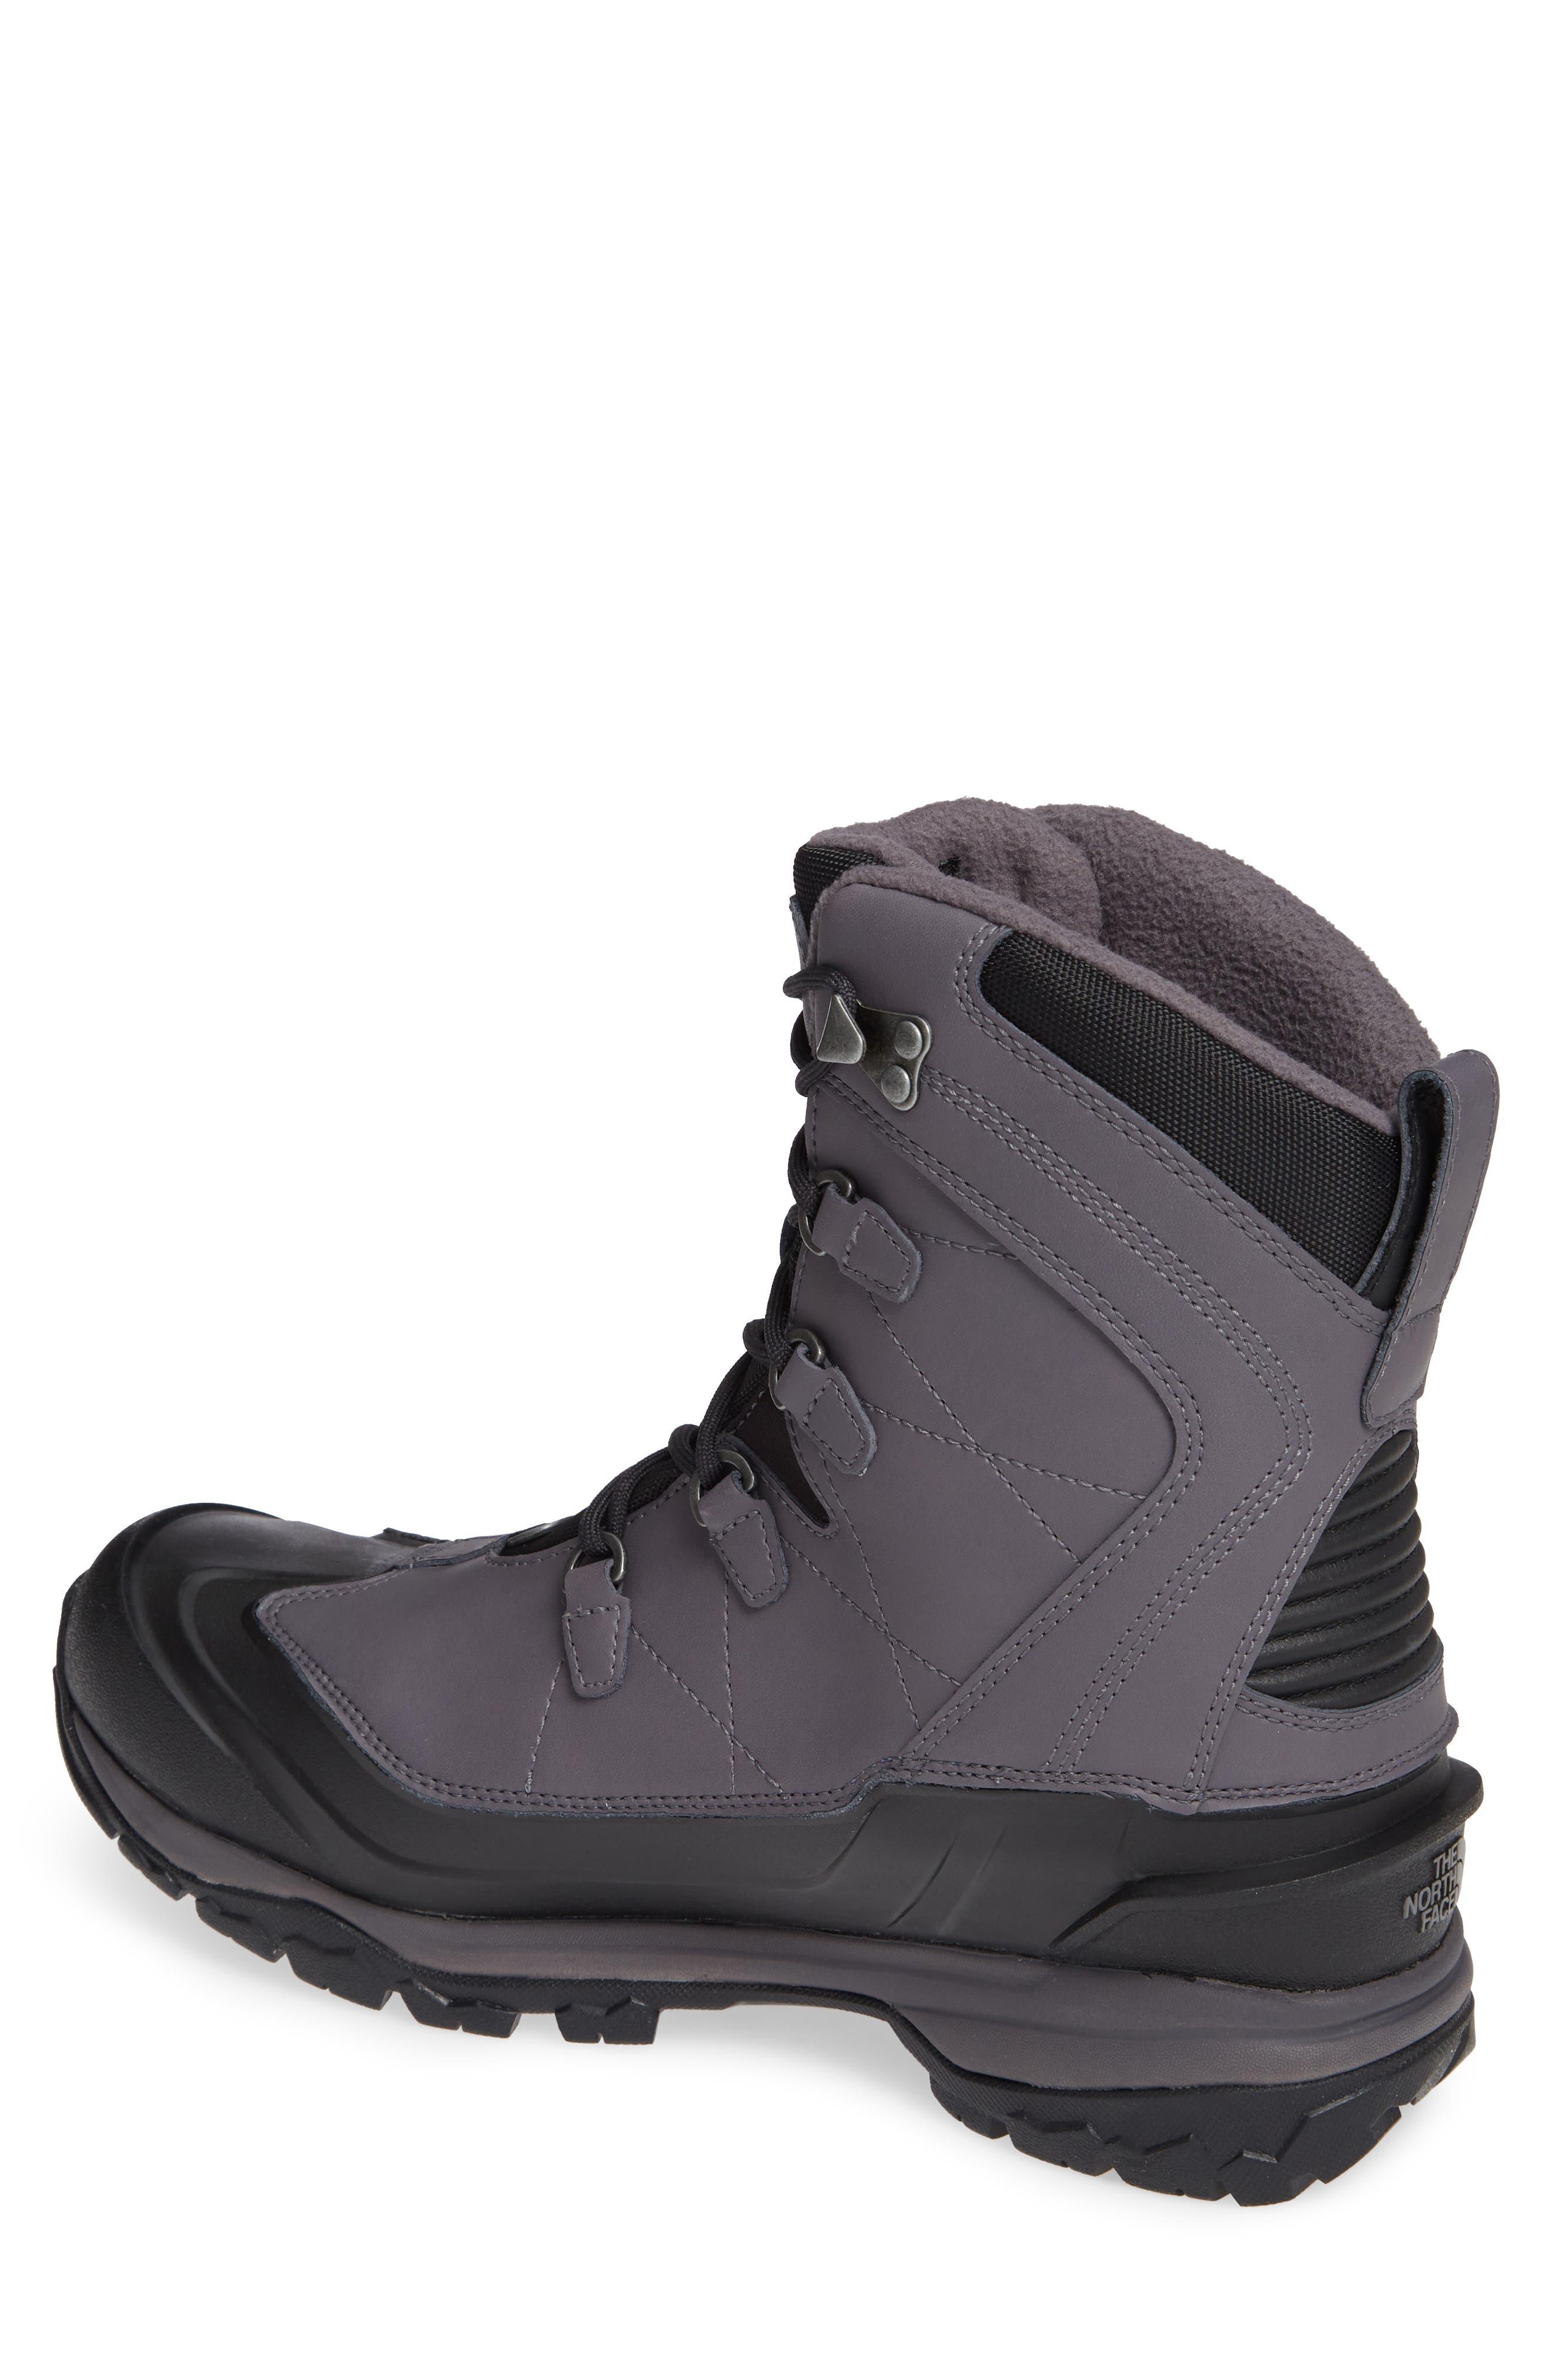 Chilkat Evo Waterproof Insulated Snow Boot,                             Alternate thumbnail 2, color,                             BLACKENED PEARL/ PHANTOM GREY